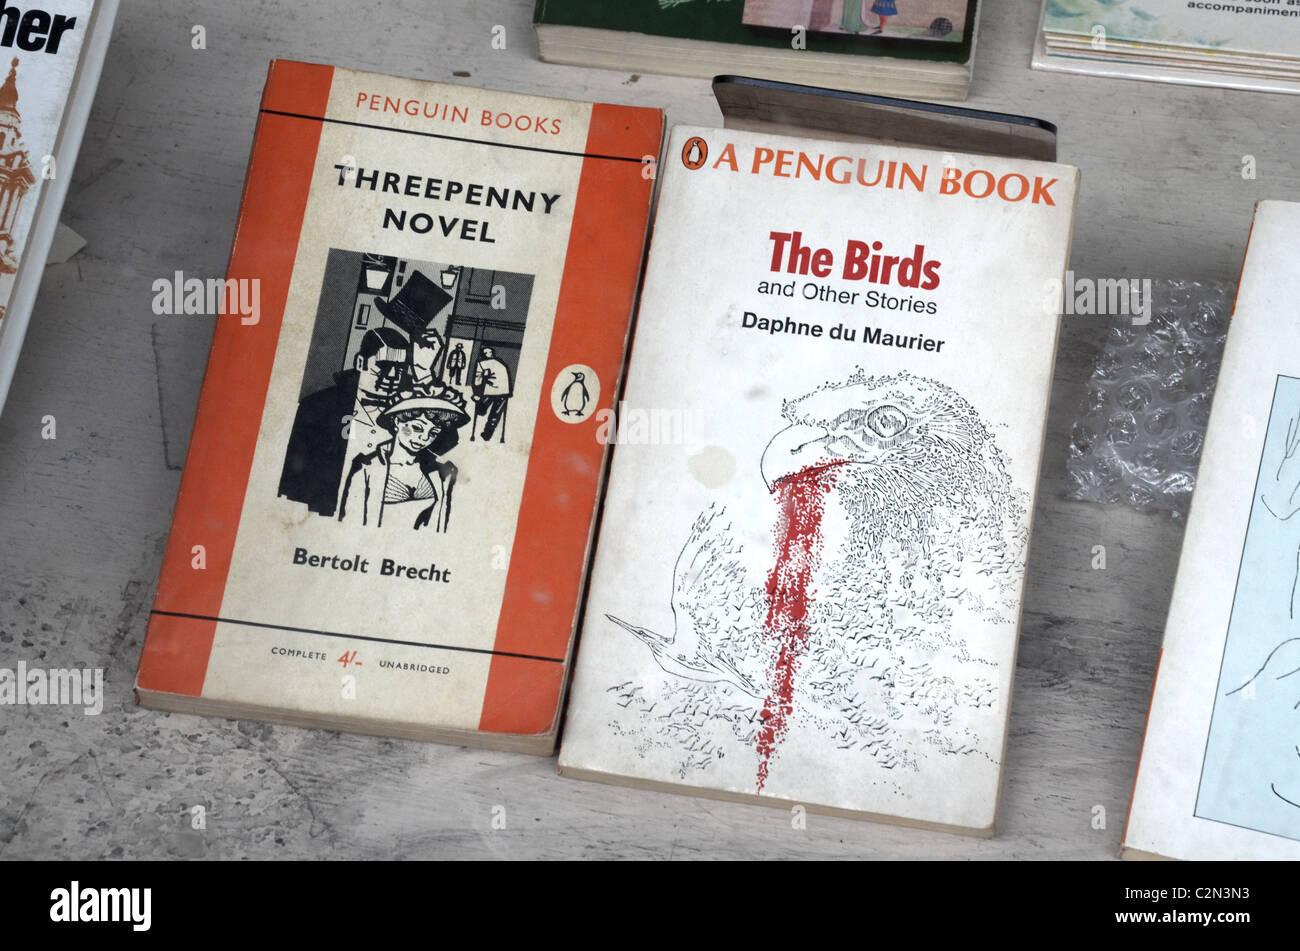 Two vintage Penguin paperbacks by Bertolt Brecht and Daphne du Maurier in a secondhand bookshop window. - Stock Image